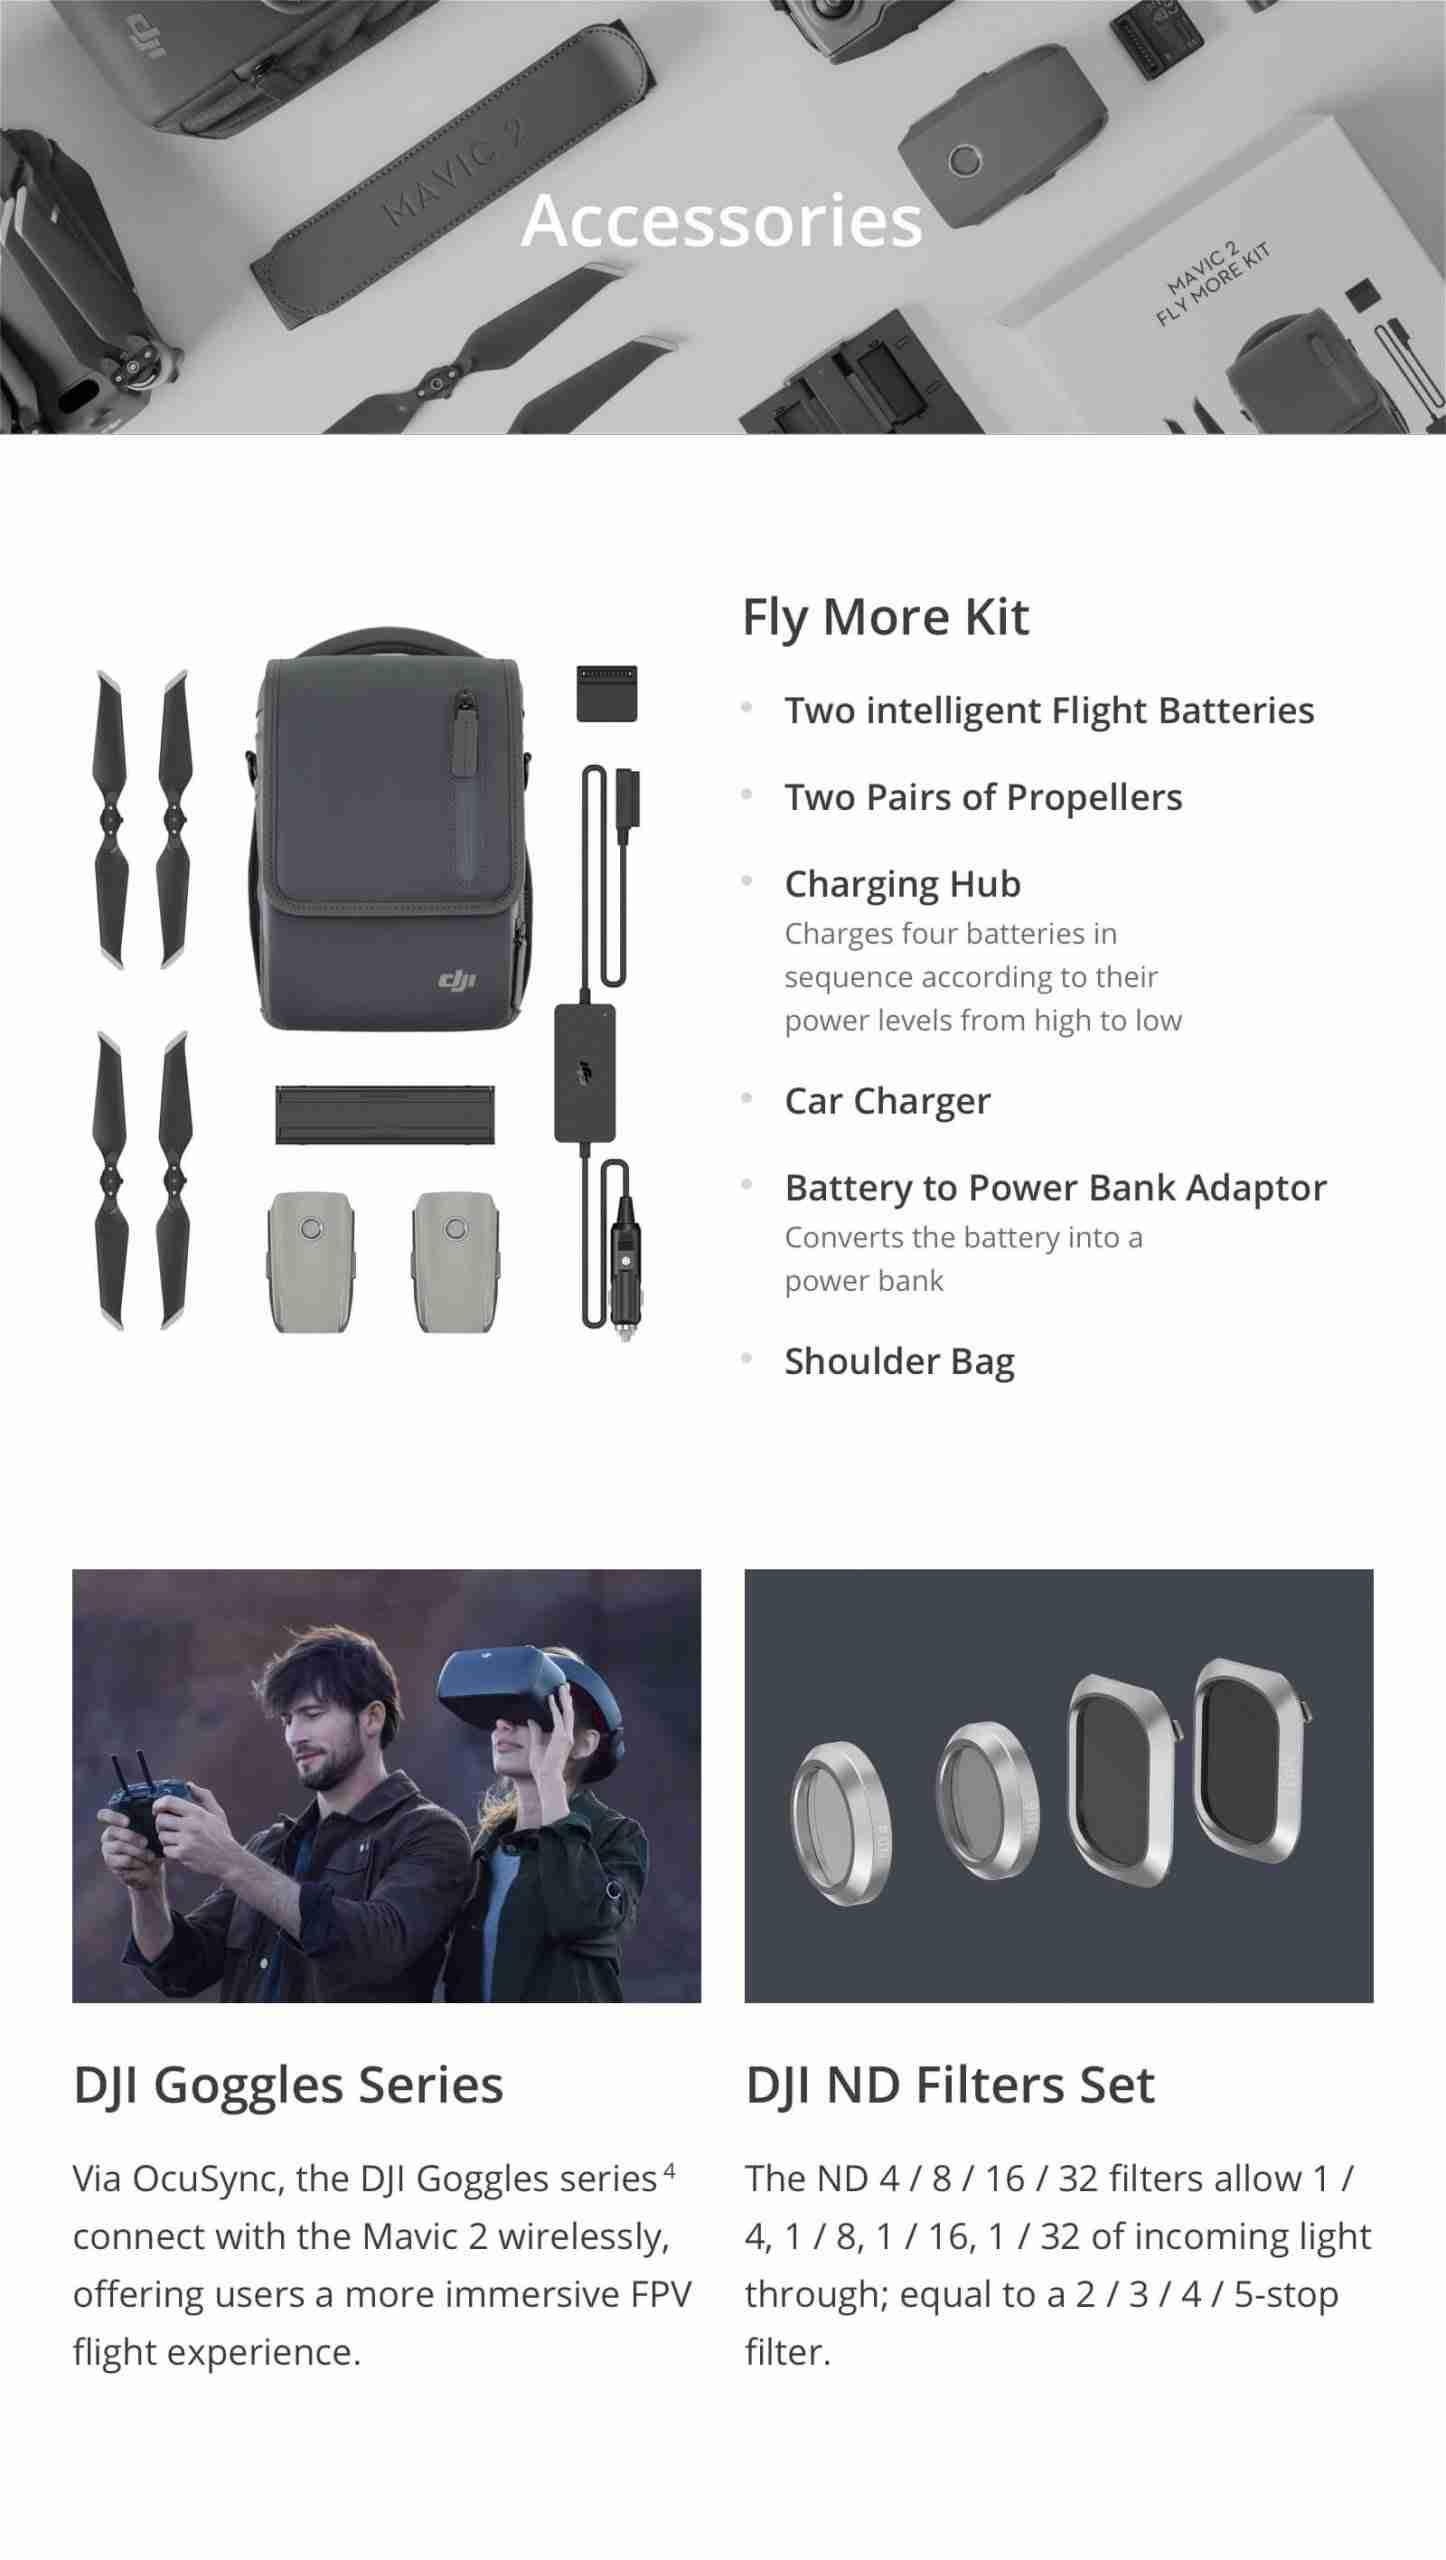 dji enterprise accessories